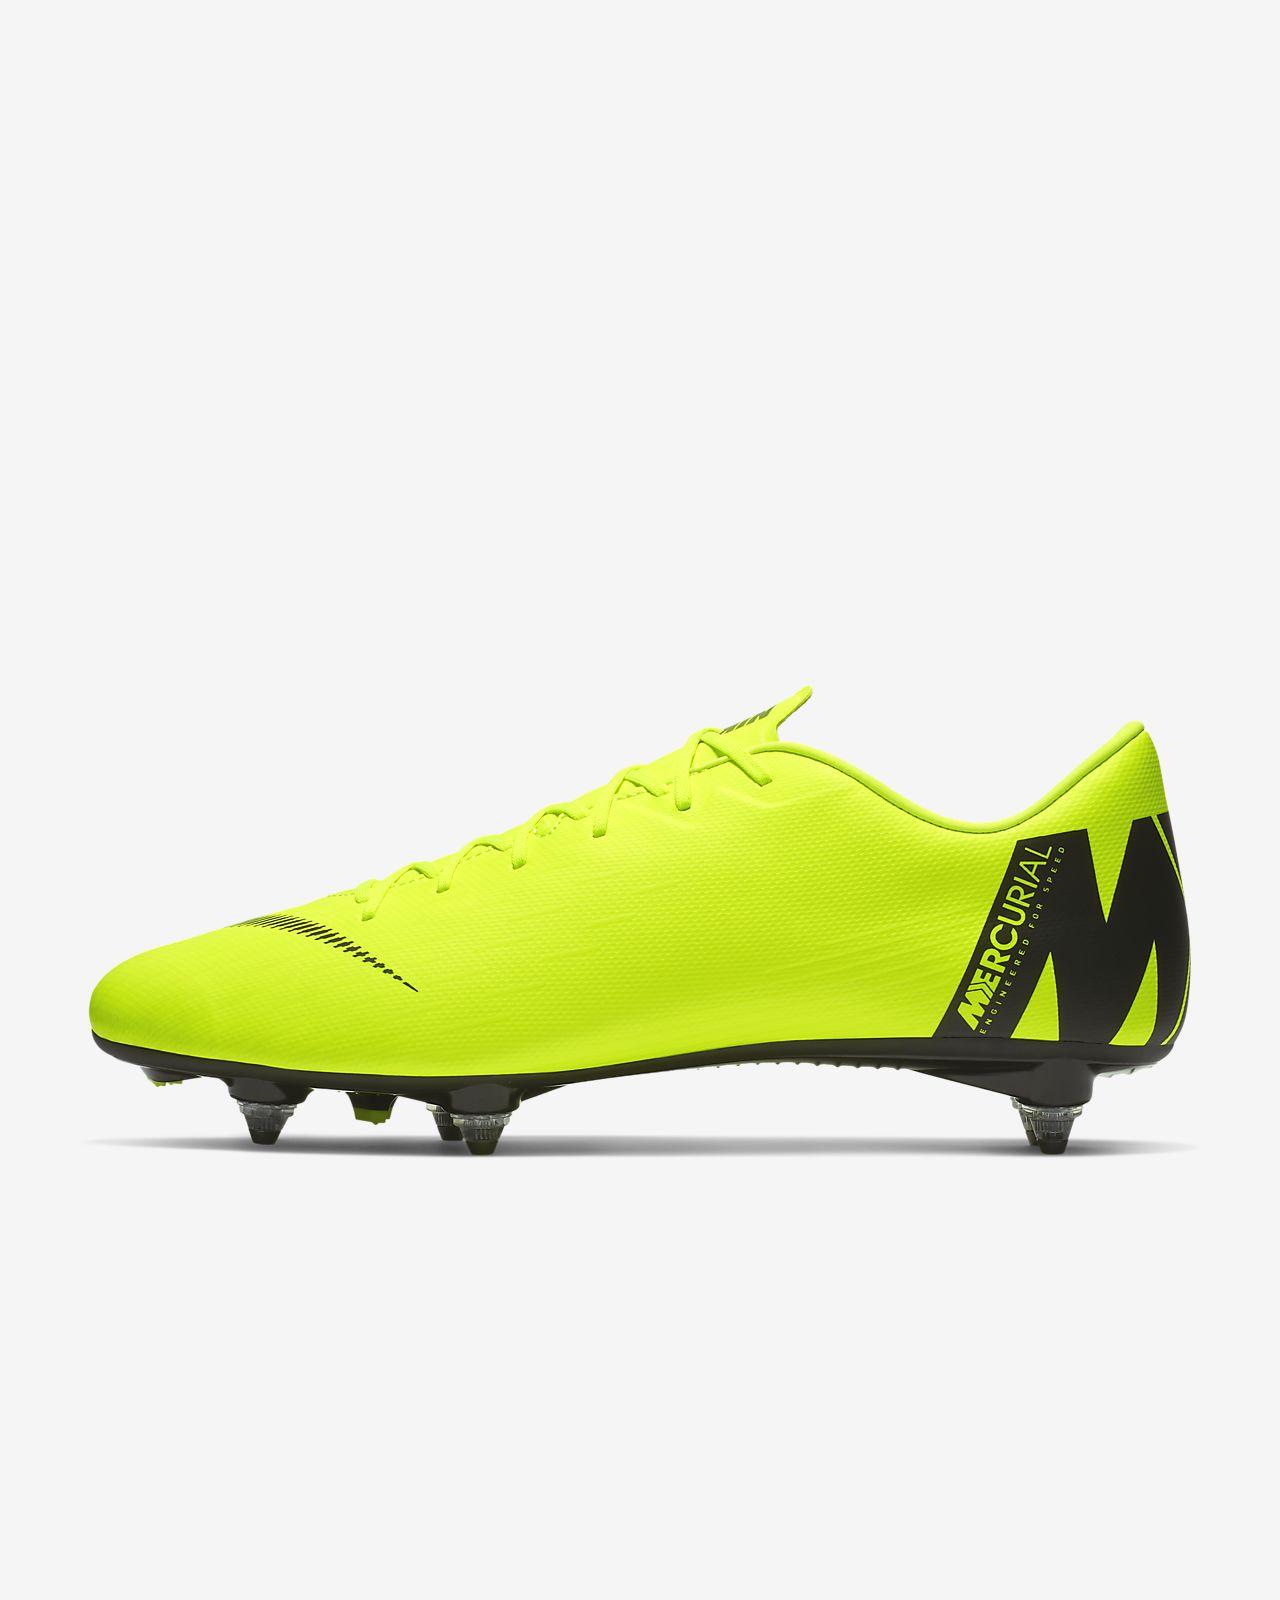 29d966d5a2d ... Ποδοσφαιρικό παπούτσι για μαλακές επιφάνειες Nike Mercurial Vapor XII  Academy SG-PRO